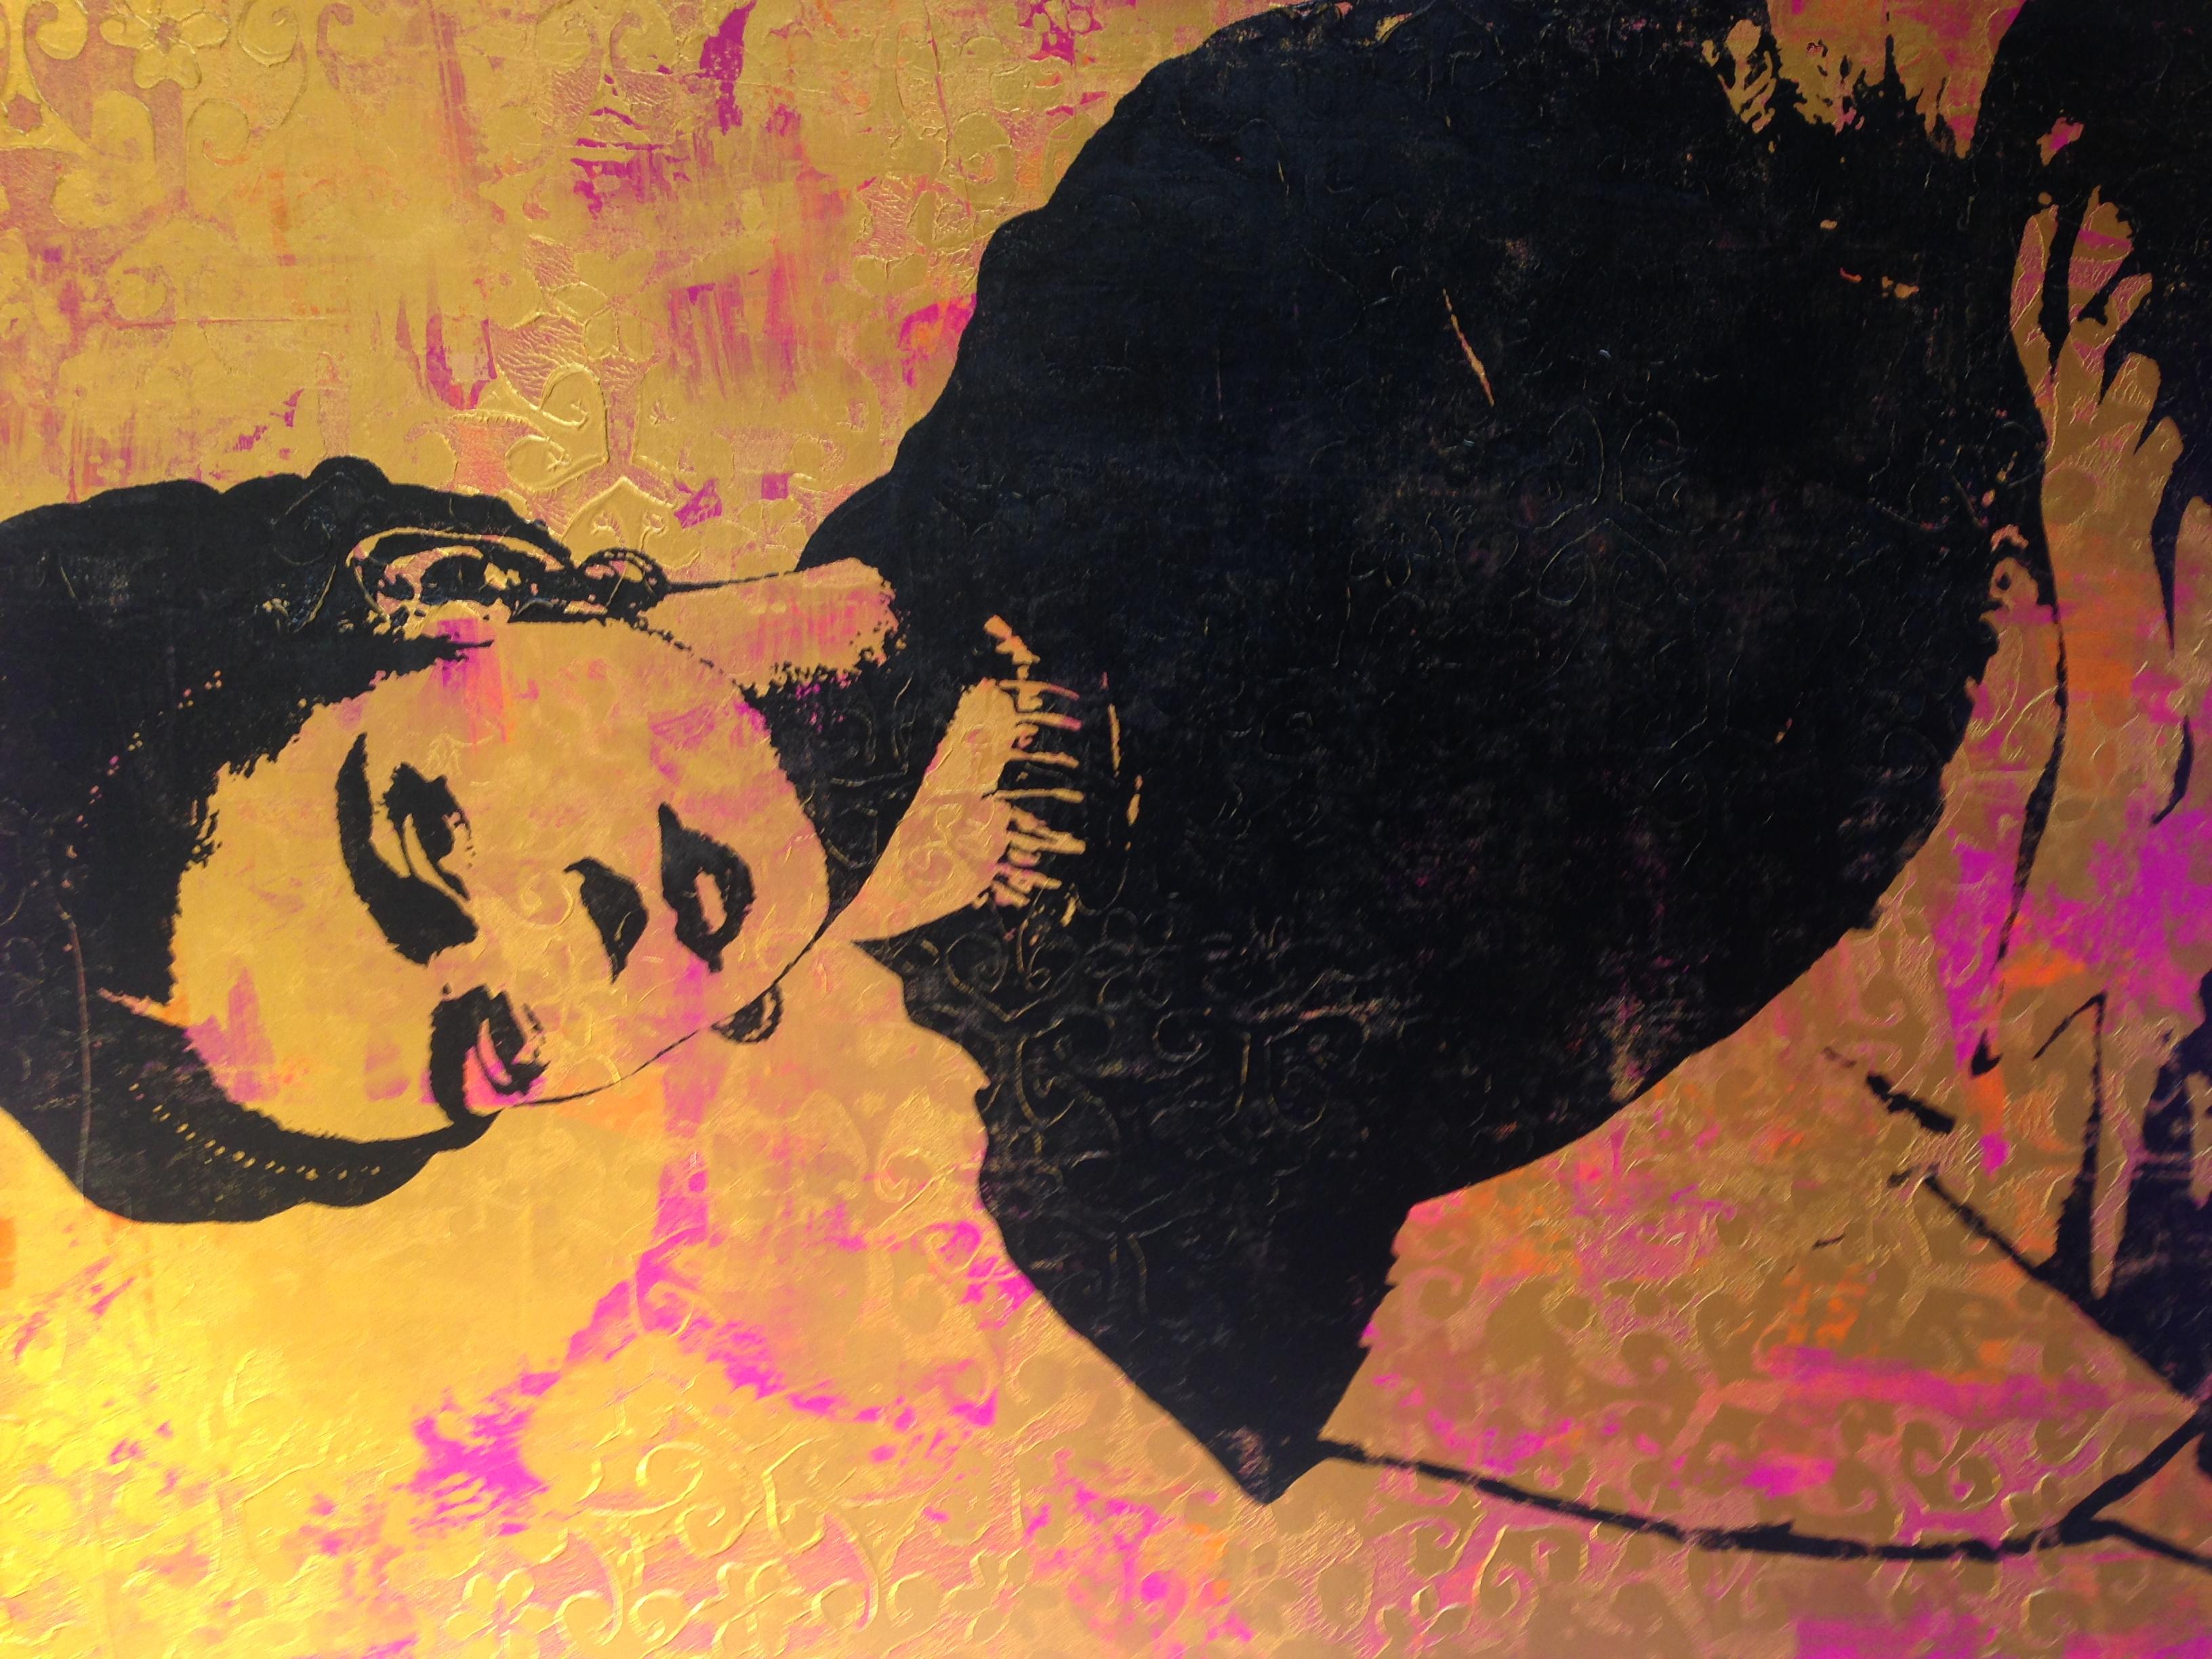 """Frida Kahlo"". Print by Georgia Barber."